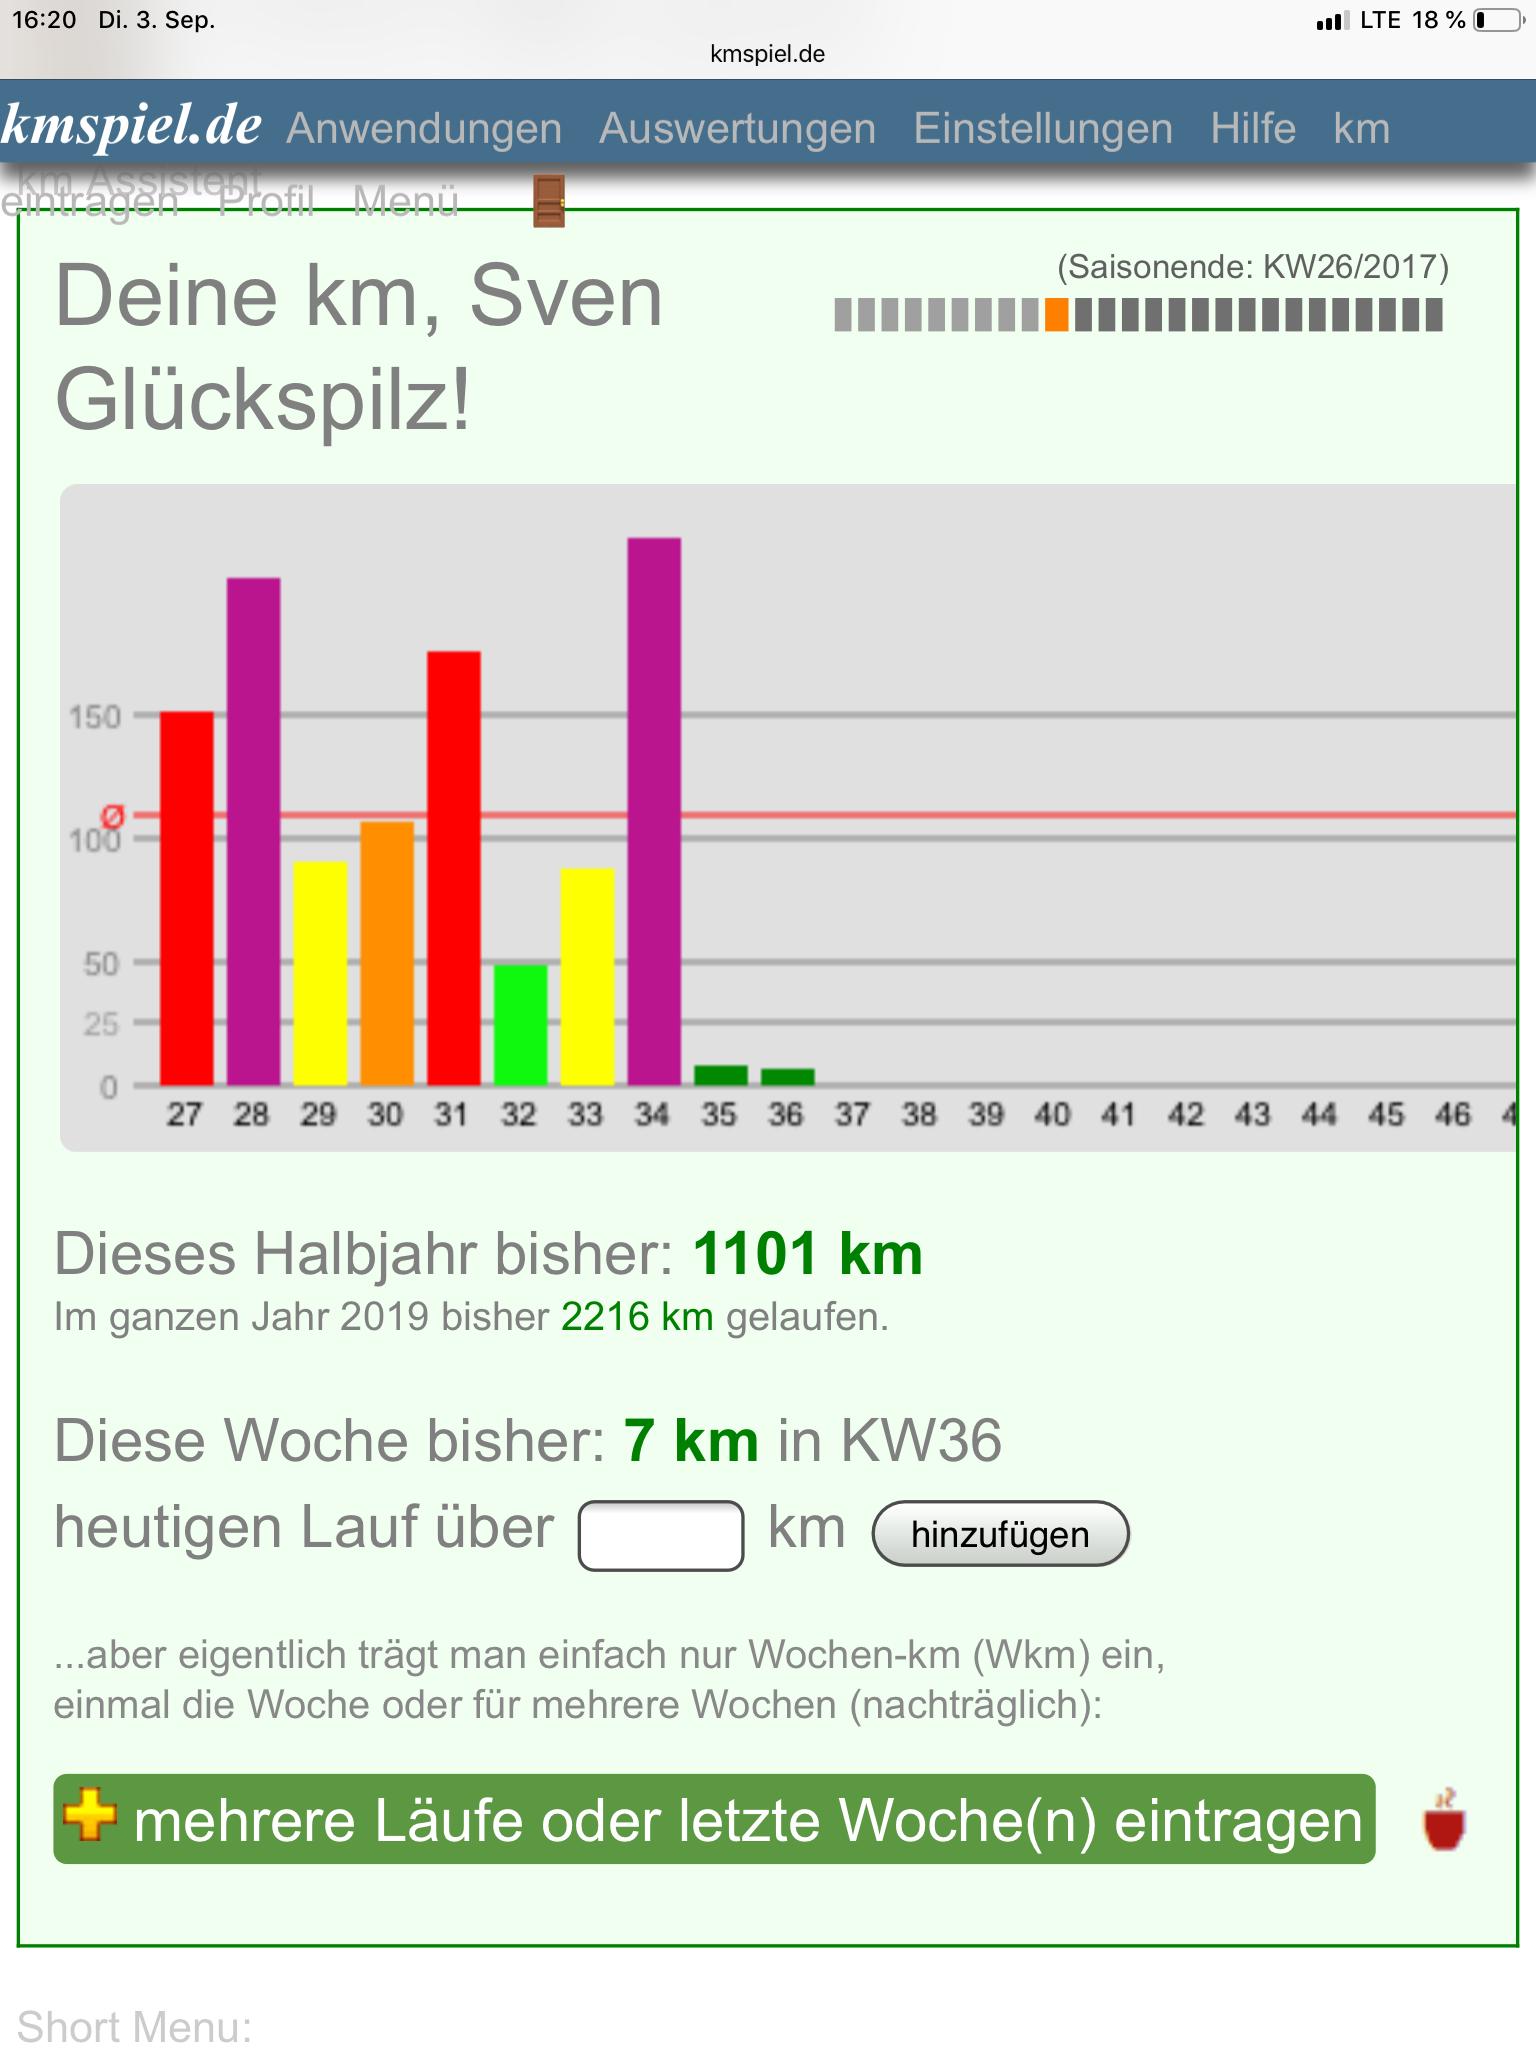 Kilometerspiel